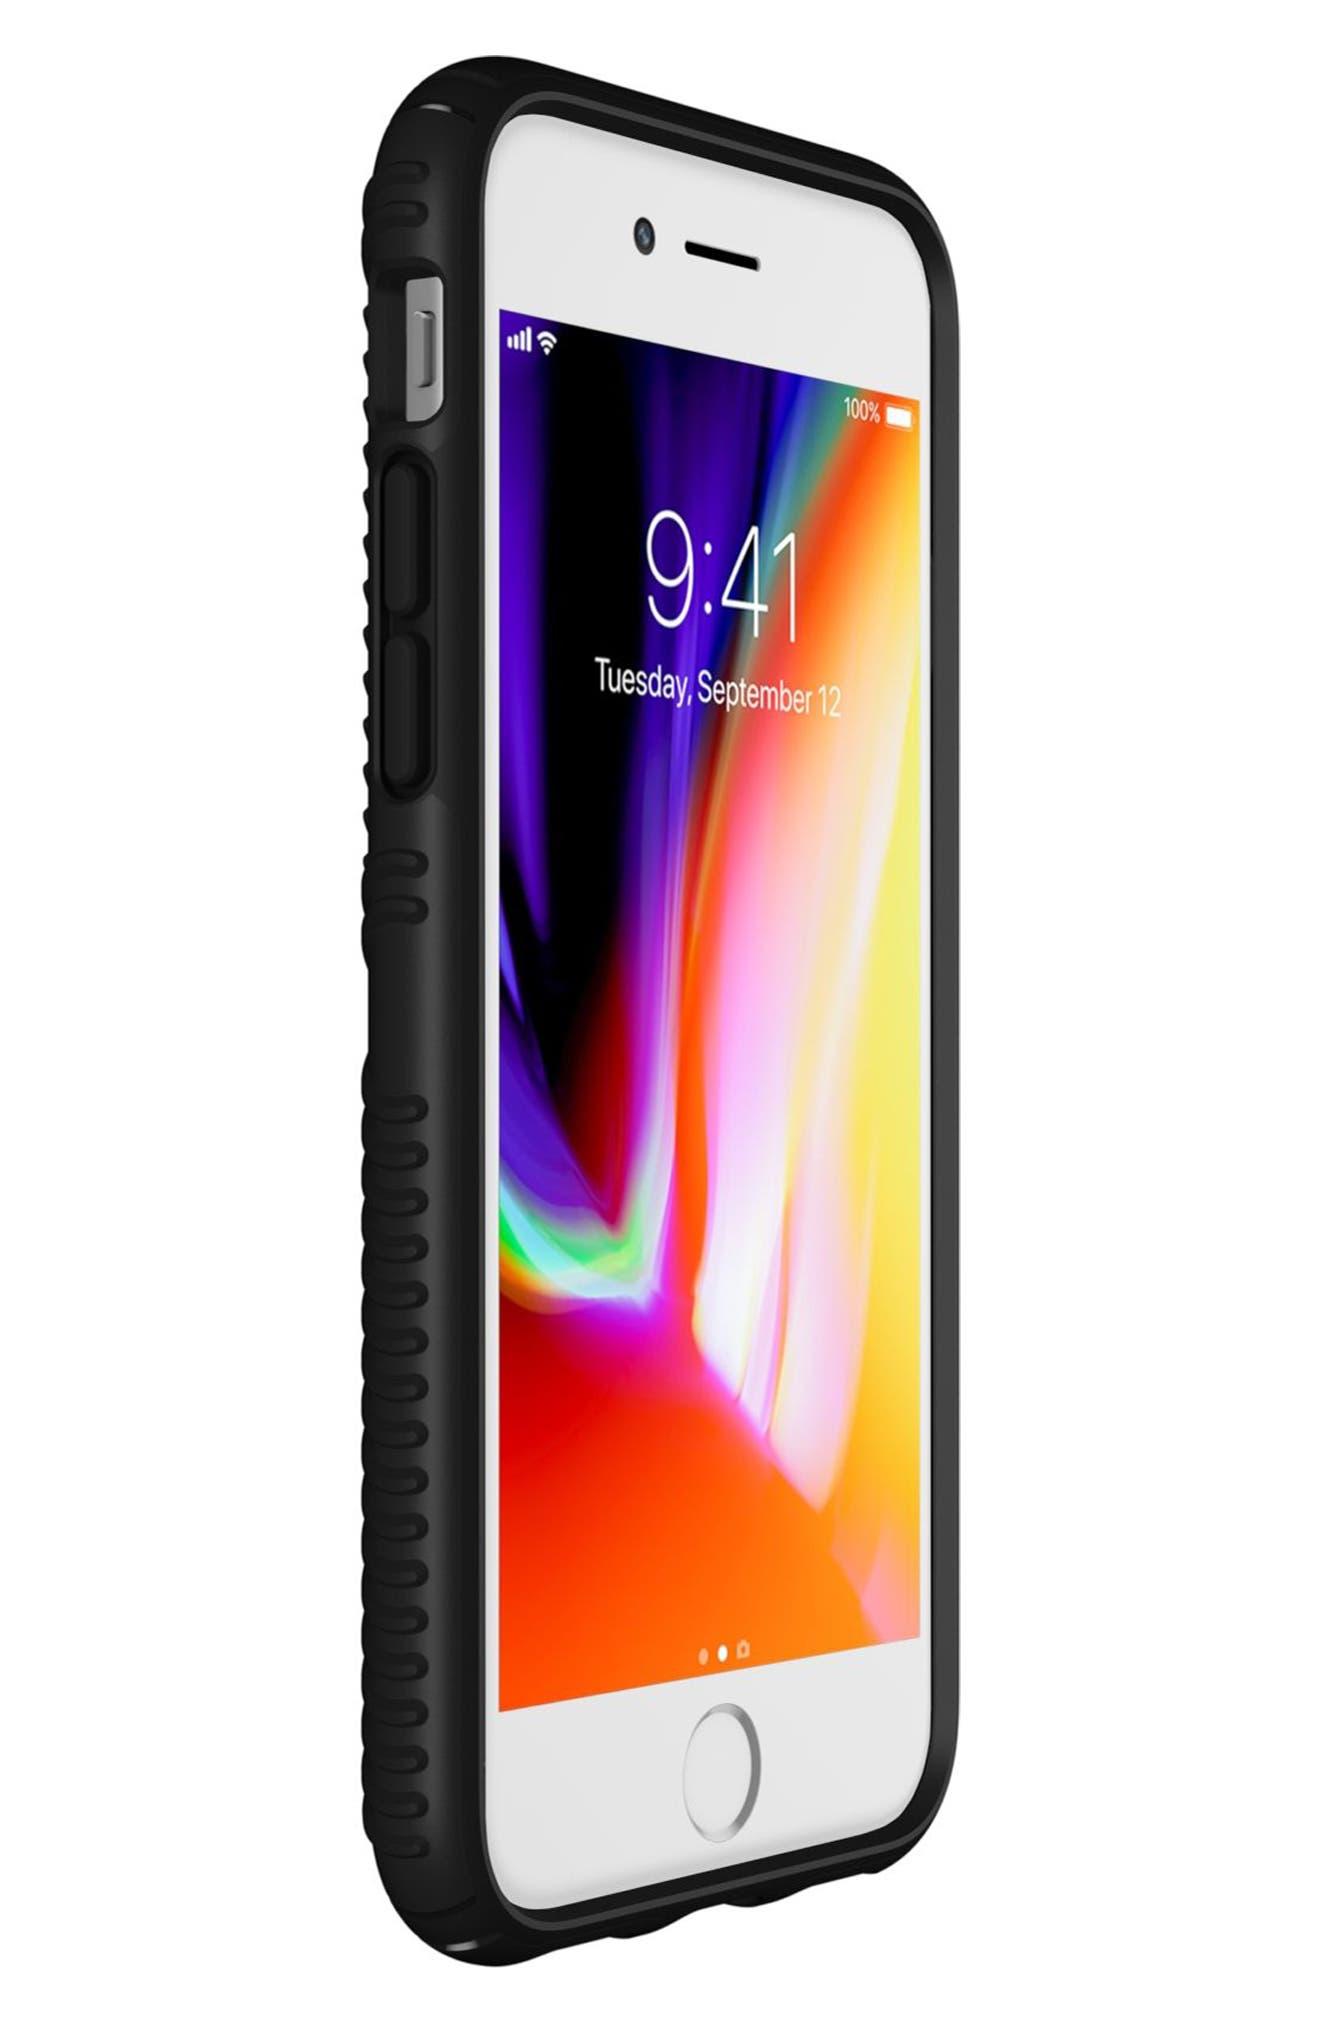 SPECK, Grip iPhone 6/6s/7/8 Case, Alternate thumbnail 4, color, 001